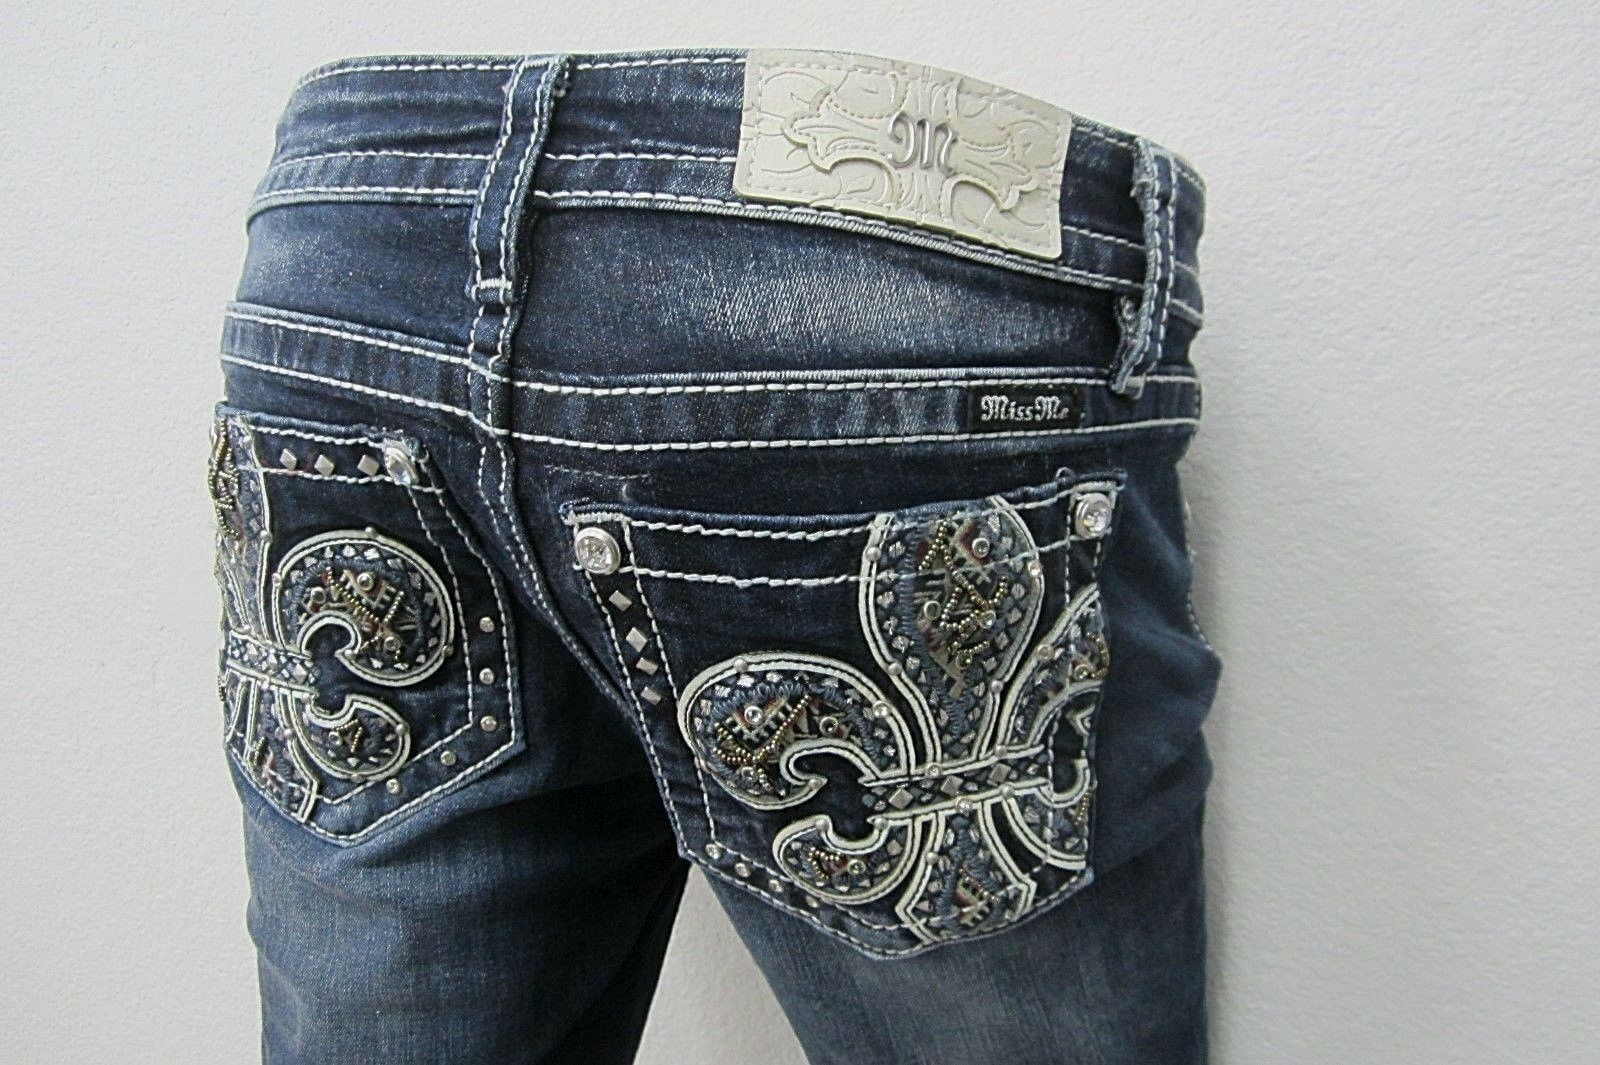 NWT Miss Me Women's Dark blue Fleur-de-lis Hailey Skinny Jeans M3206S Sz 26 x L30